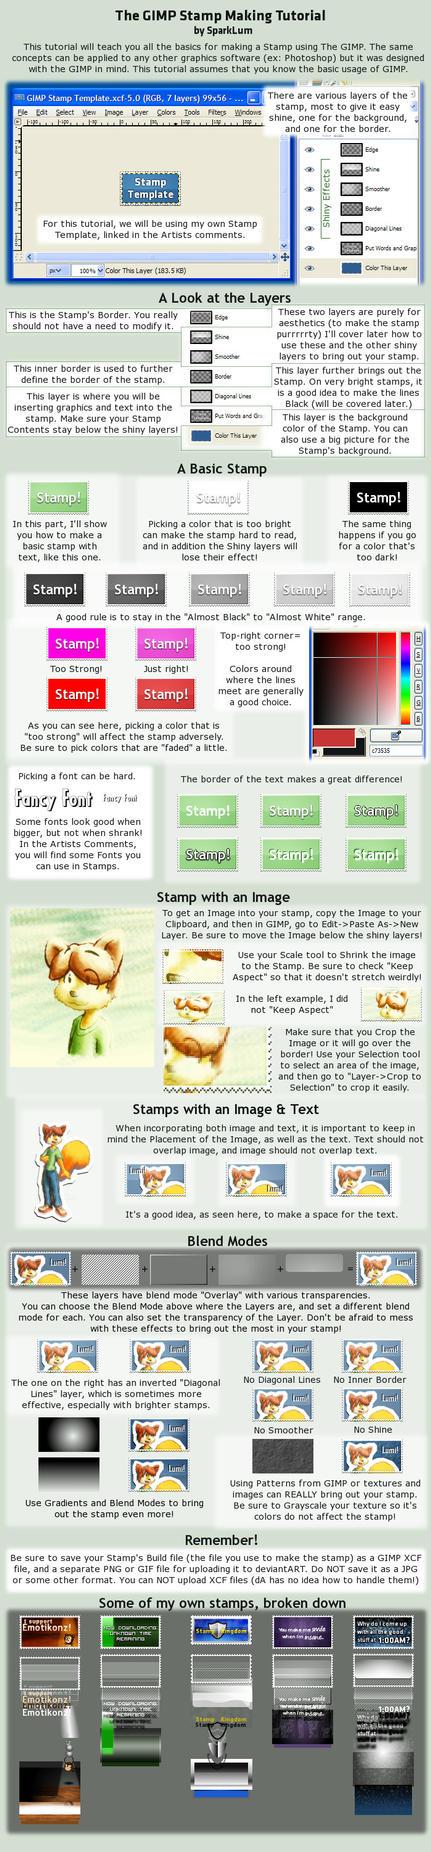 Stamp Tutorial by SparkLum